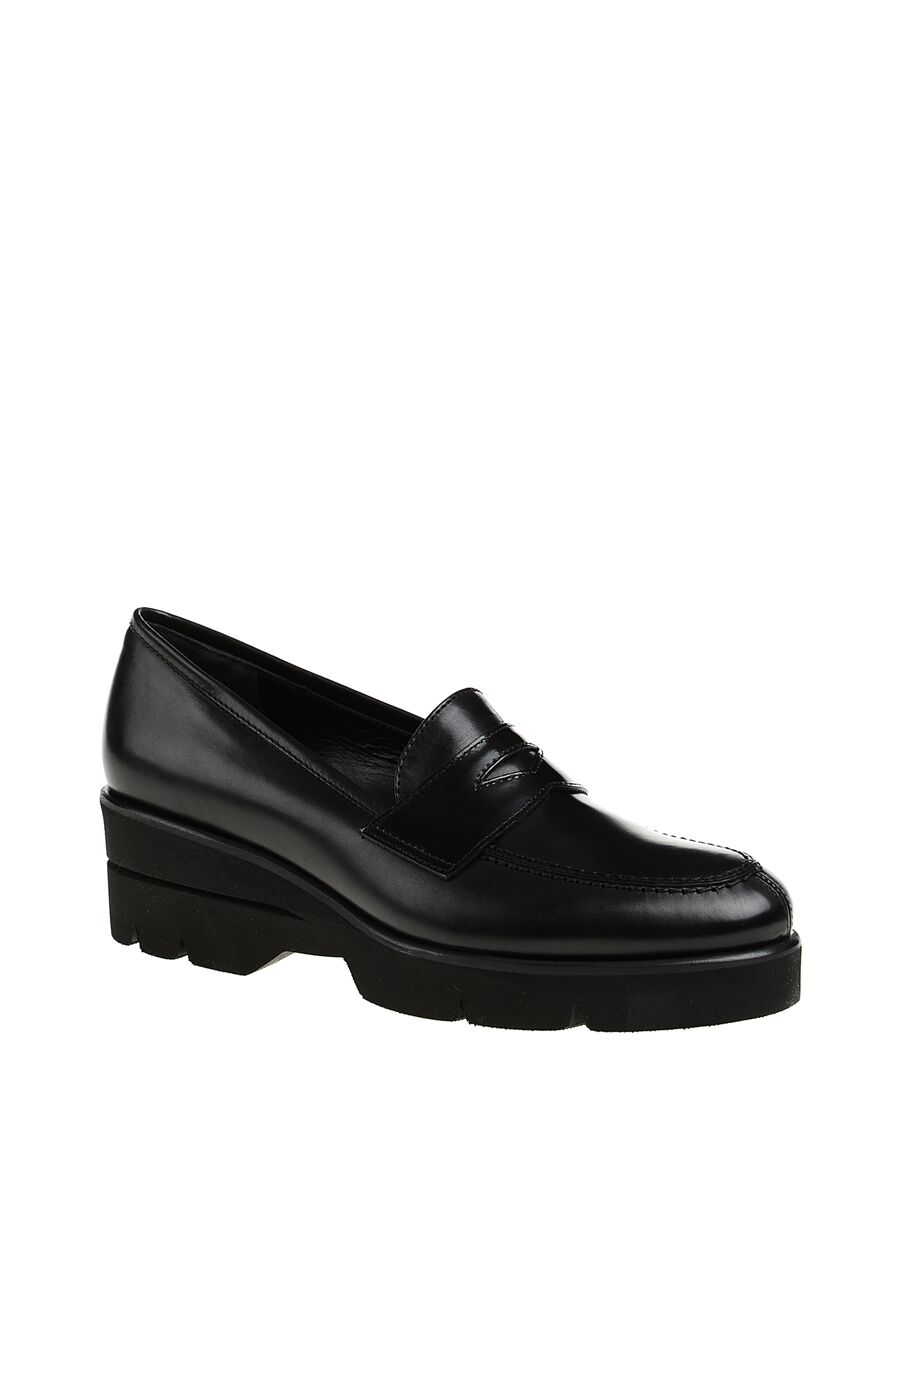 Luca Grossı Siyah Deri Loafer – 479.0 TL